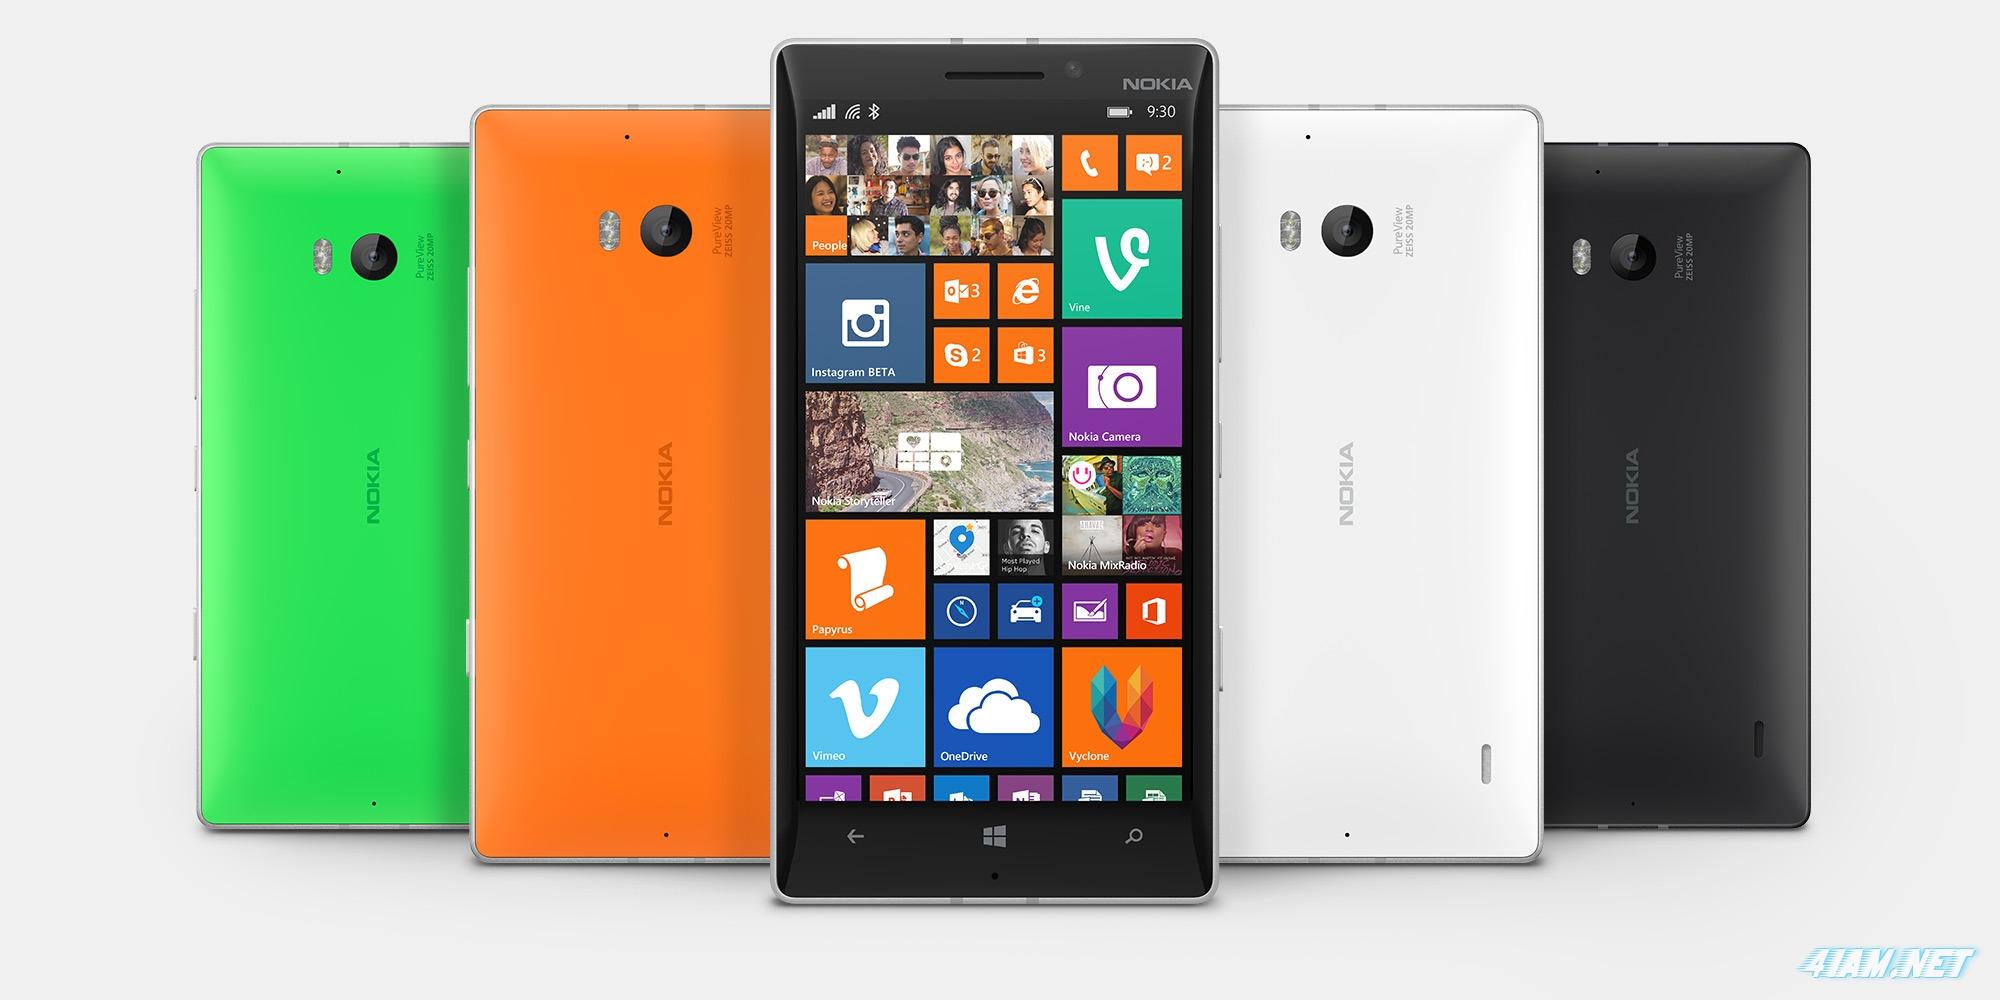 Nokia представила Lumia 630, Lumia 635 и Lumia 930 на Windows Phone 8.1